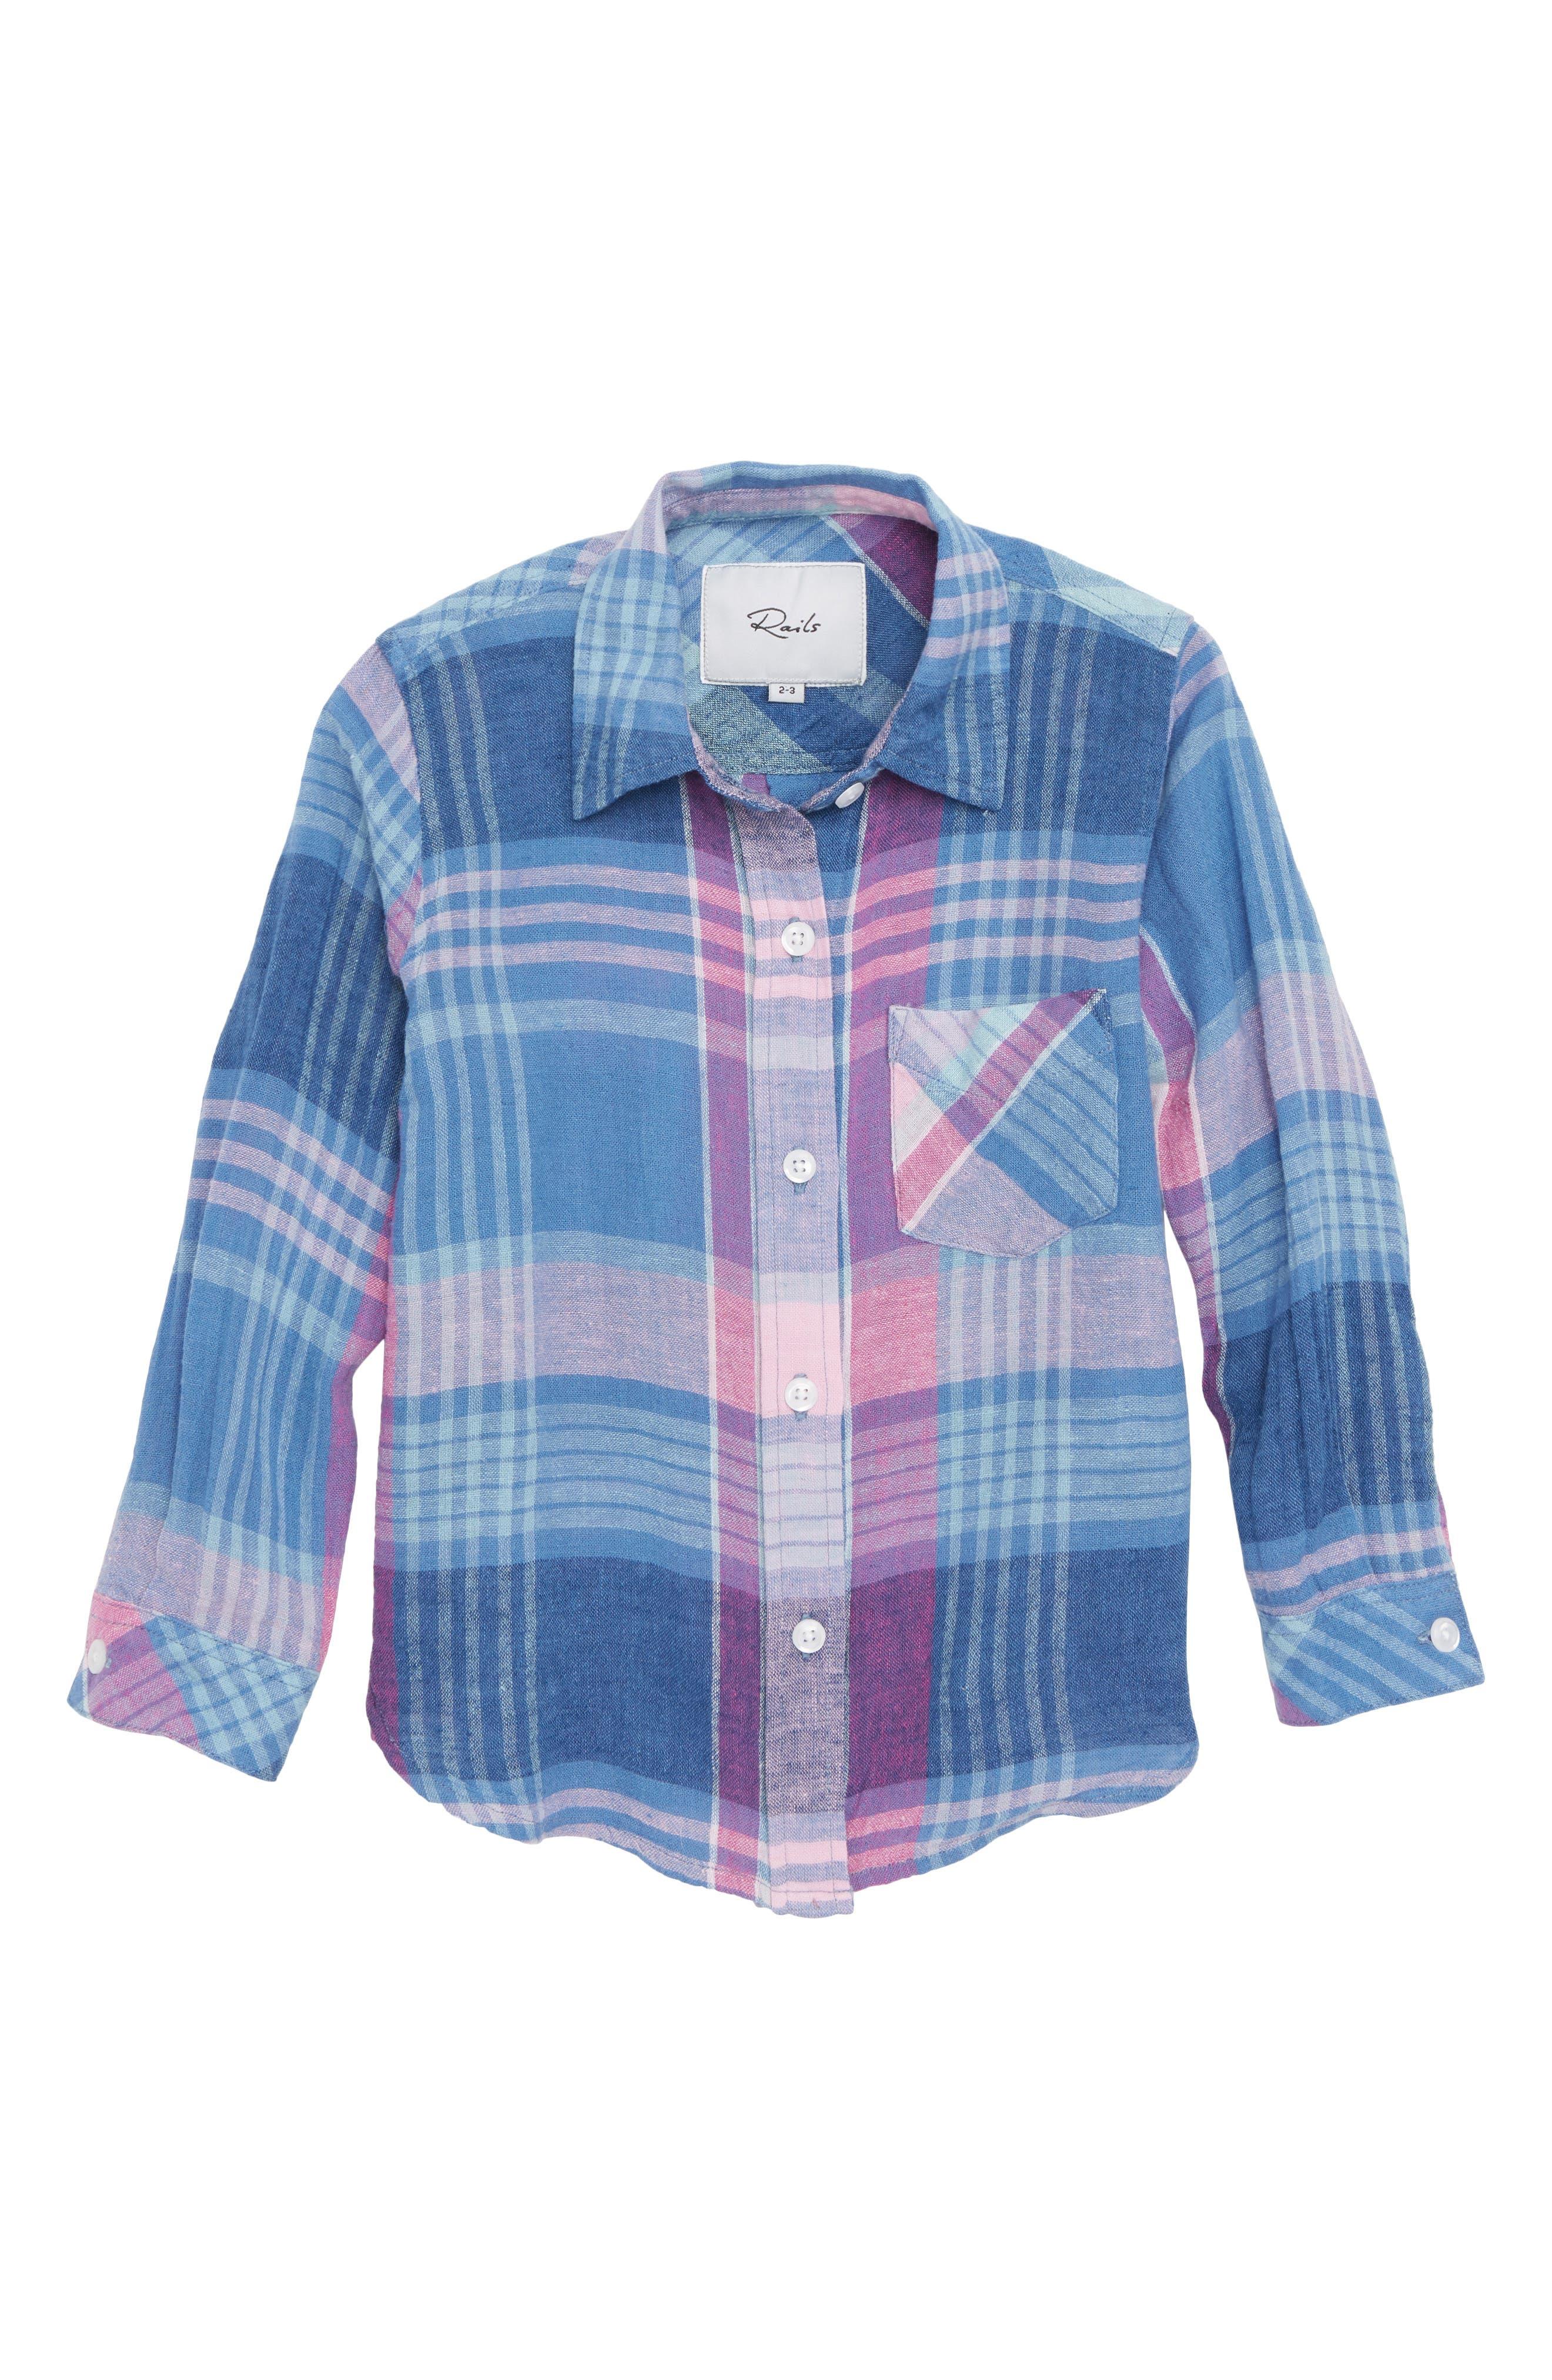 RAILS Cora Plaid Shirt, Main, color, 429